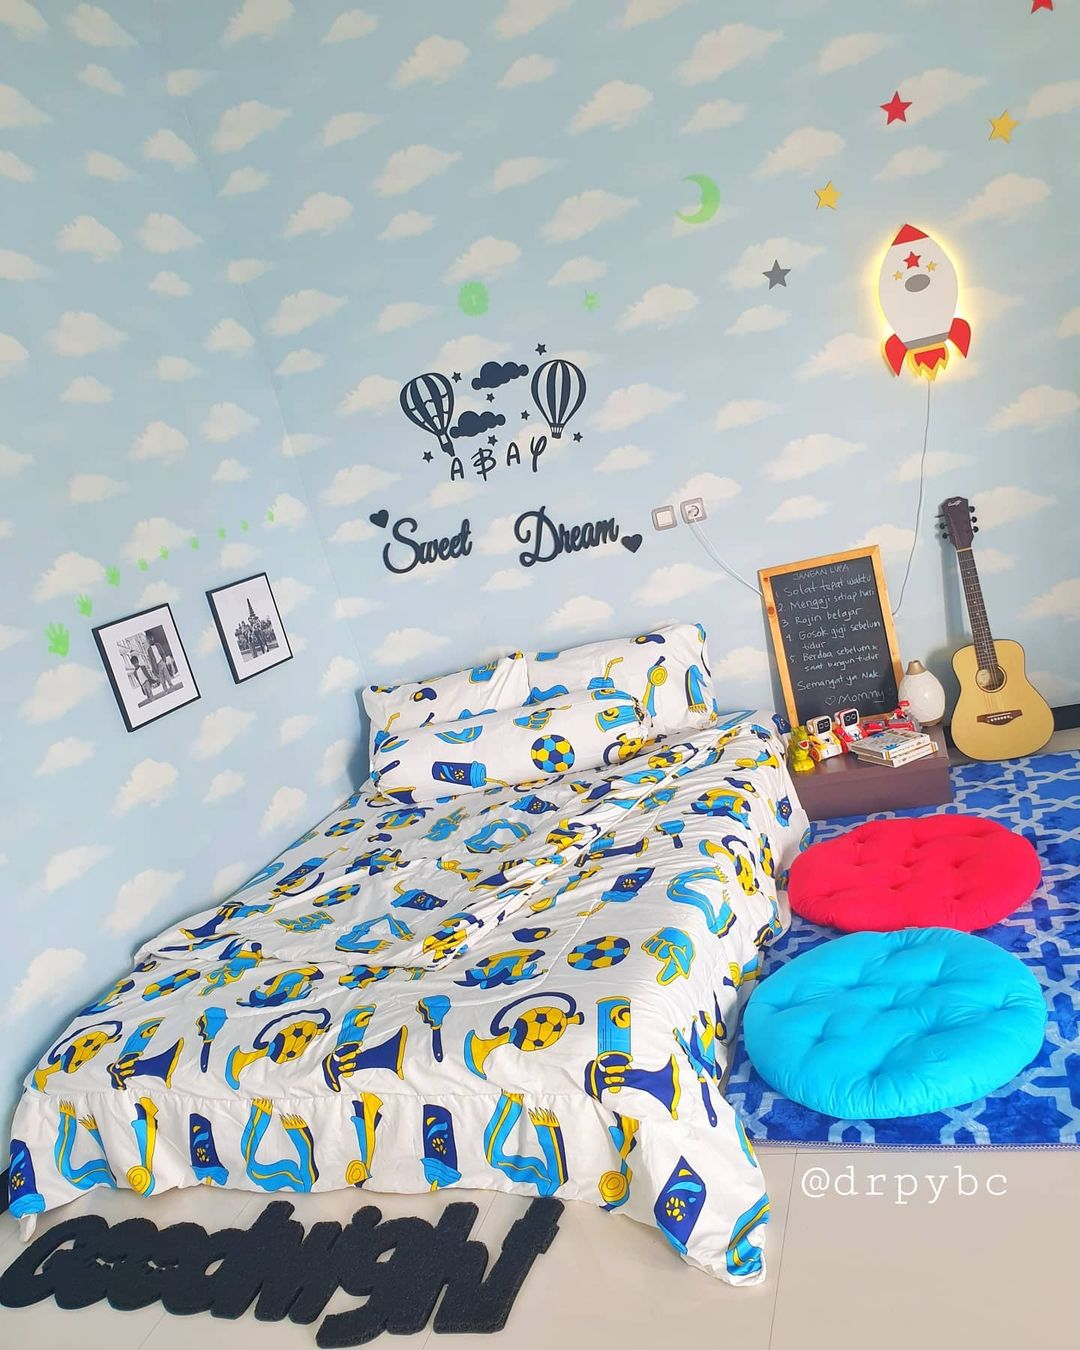 Desain Kamar Tidur Anak Minimalis_5